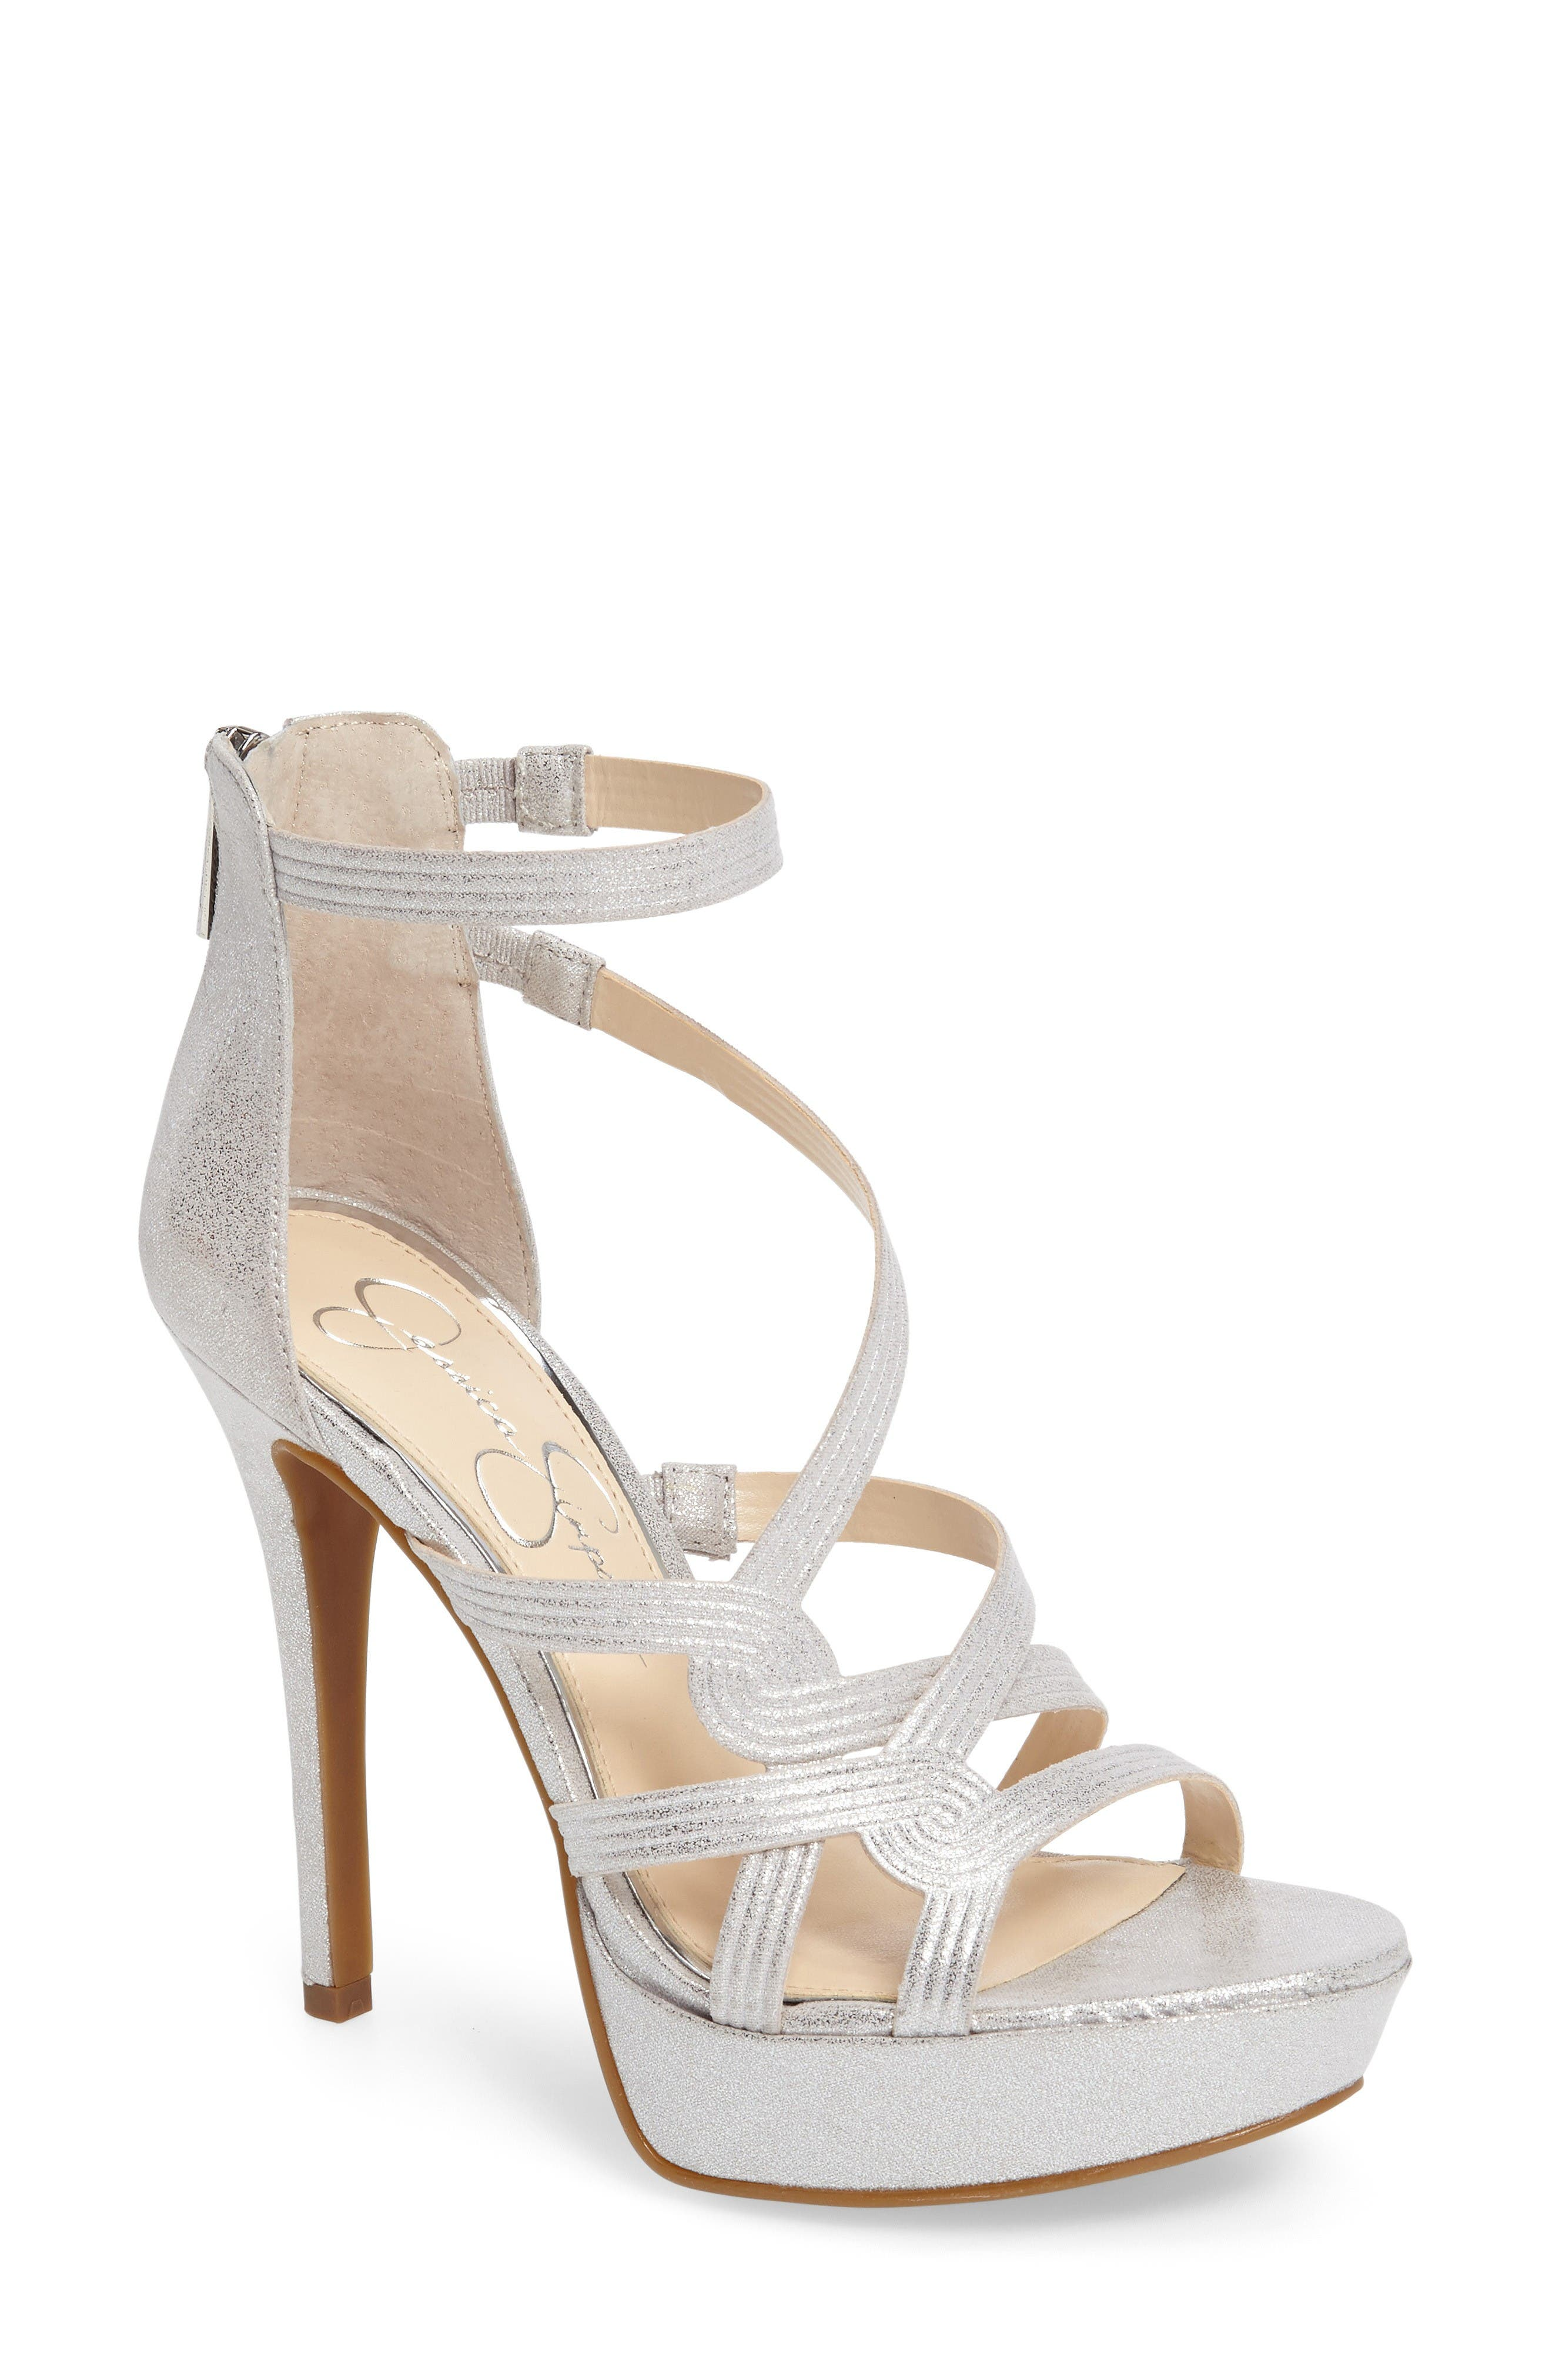 Main Image - Jessica Simpson Bellanne Platform Sandal (Women)